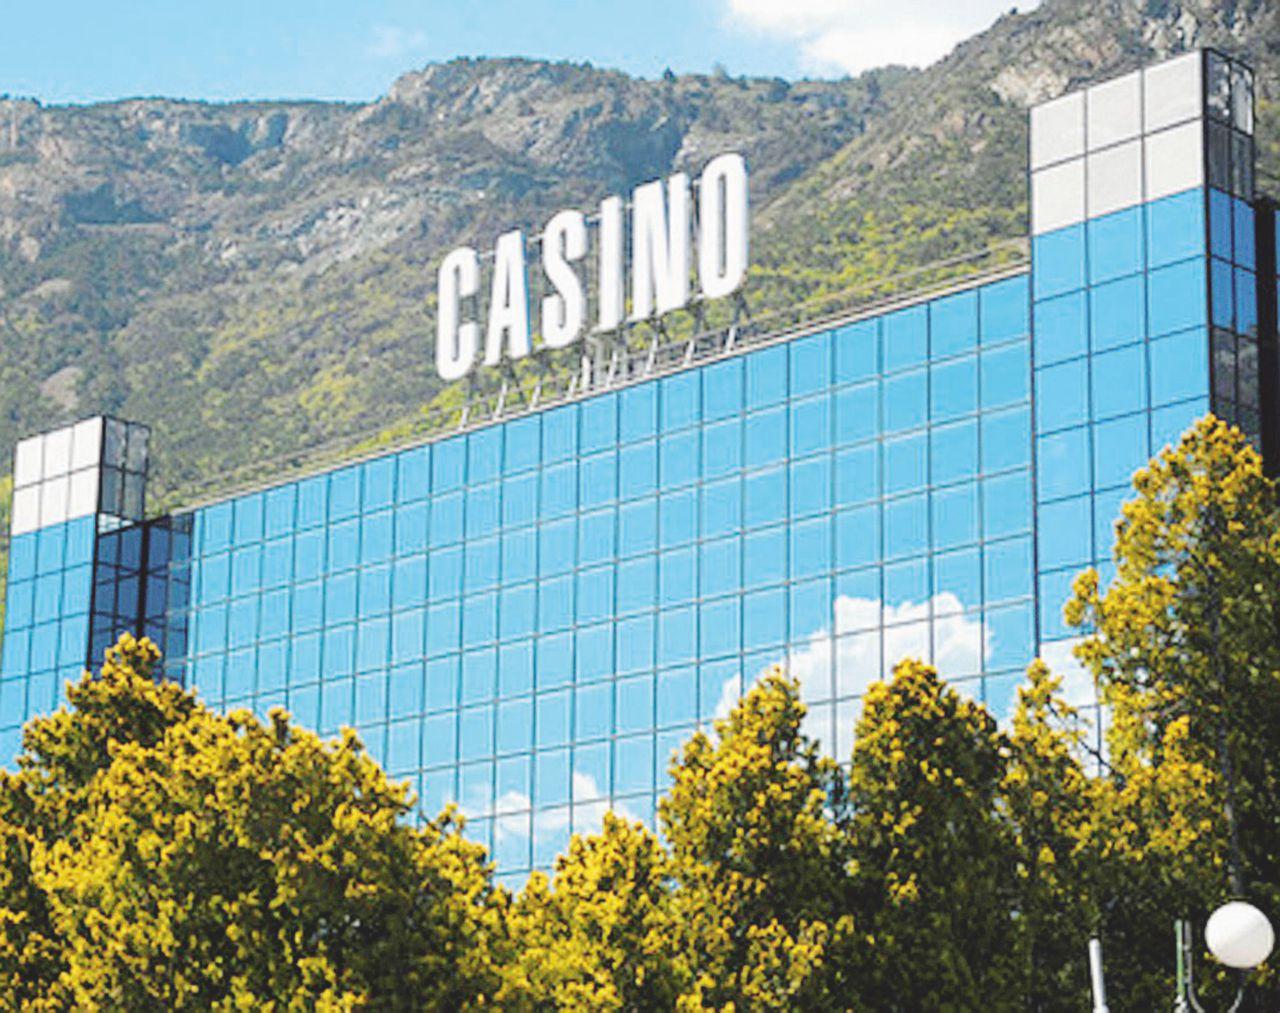 Che casinò in Valle d'Aosta: truffa e milioni di danni